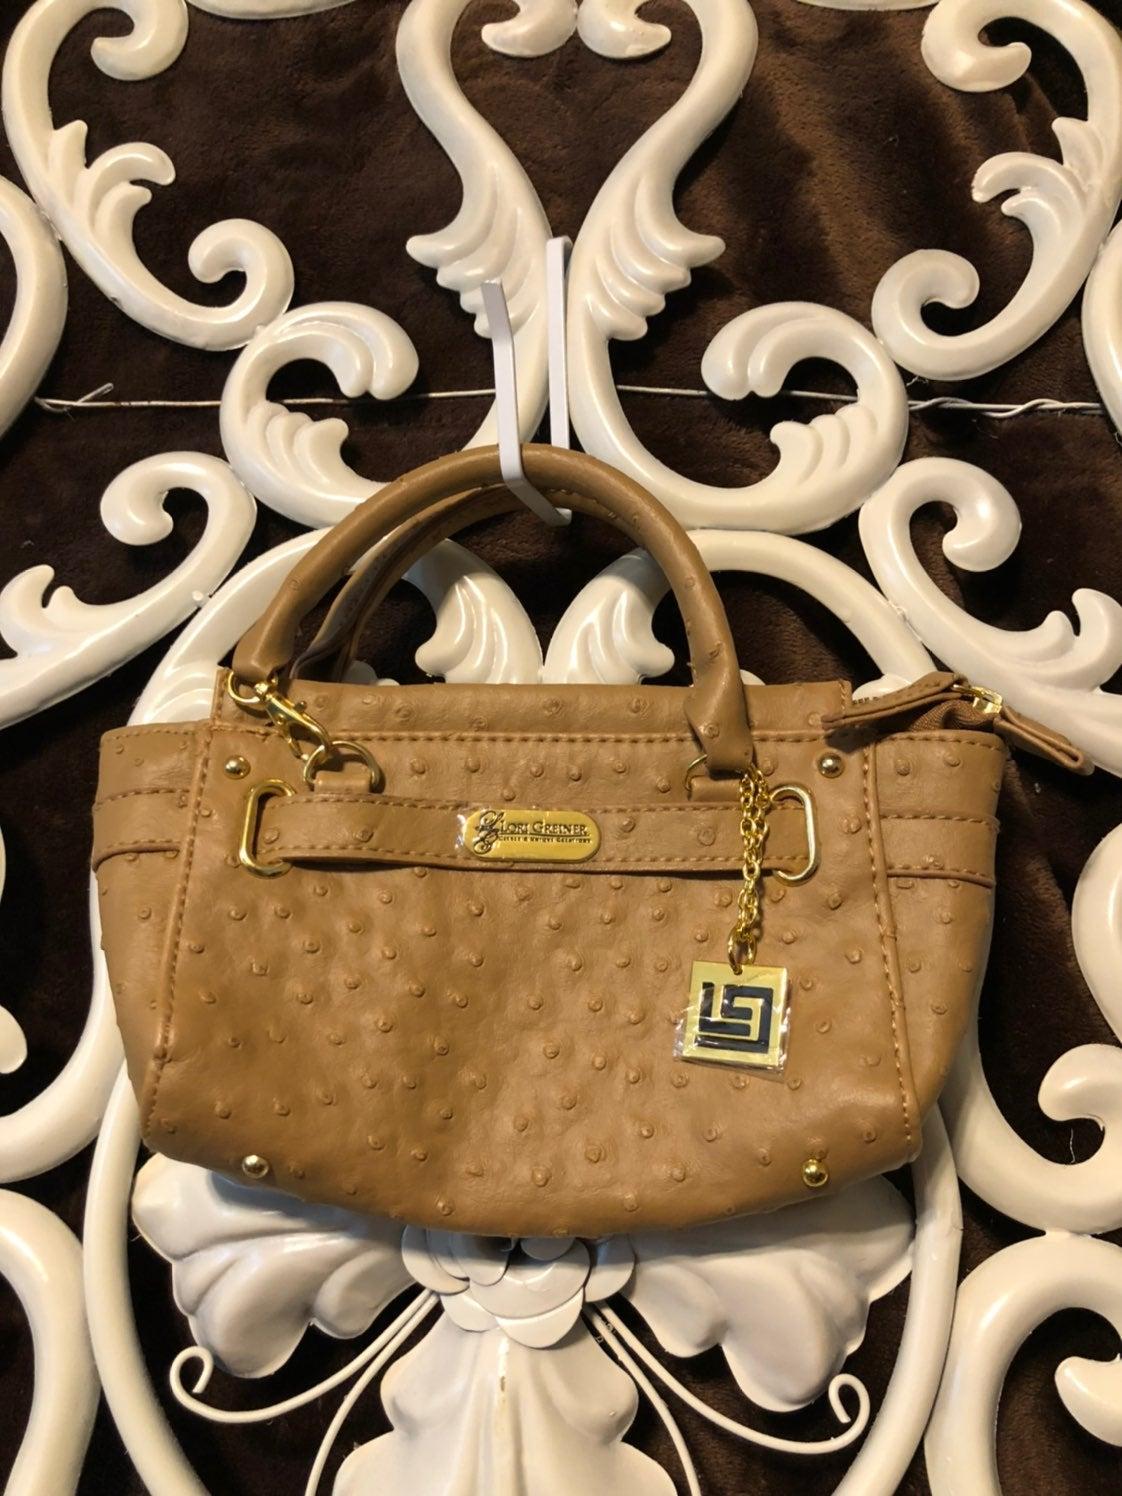 Cell phone purse Lori Greiner Clutch Bag